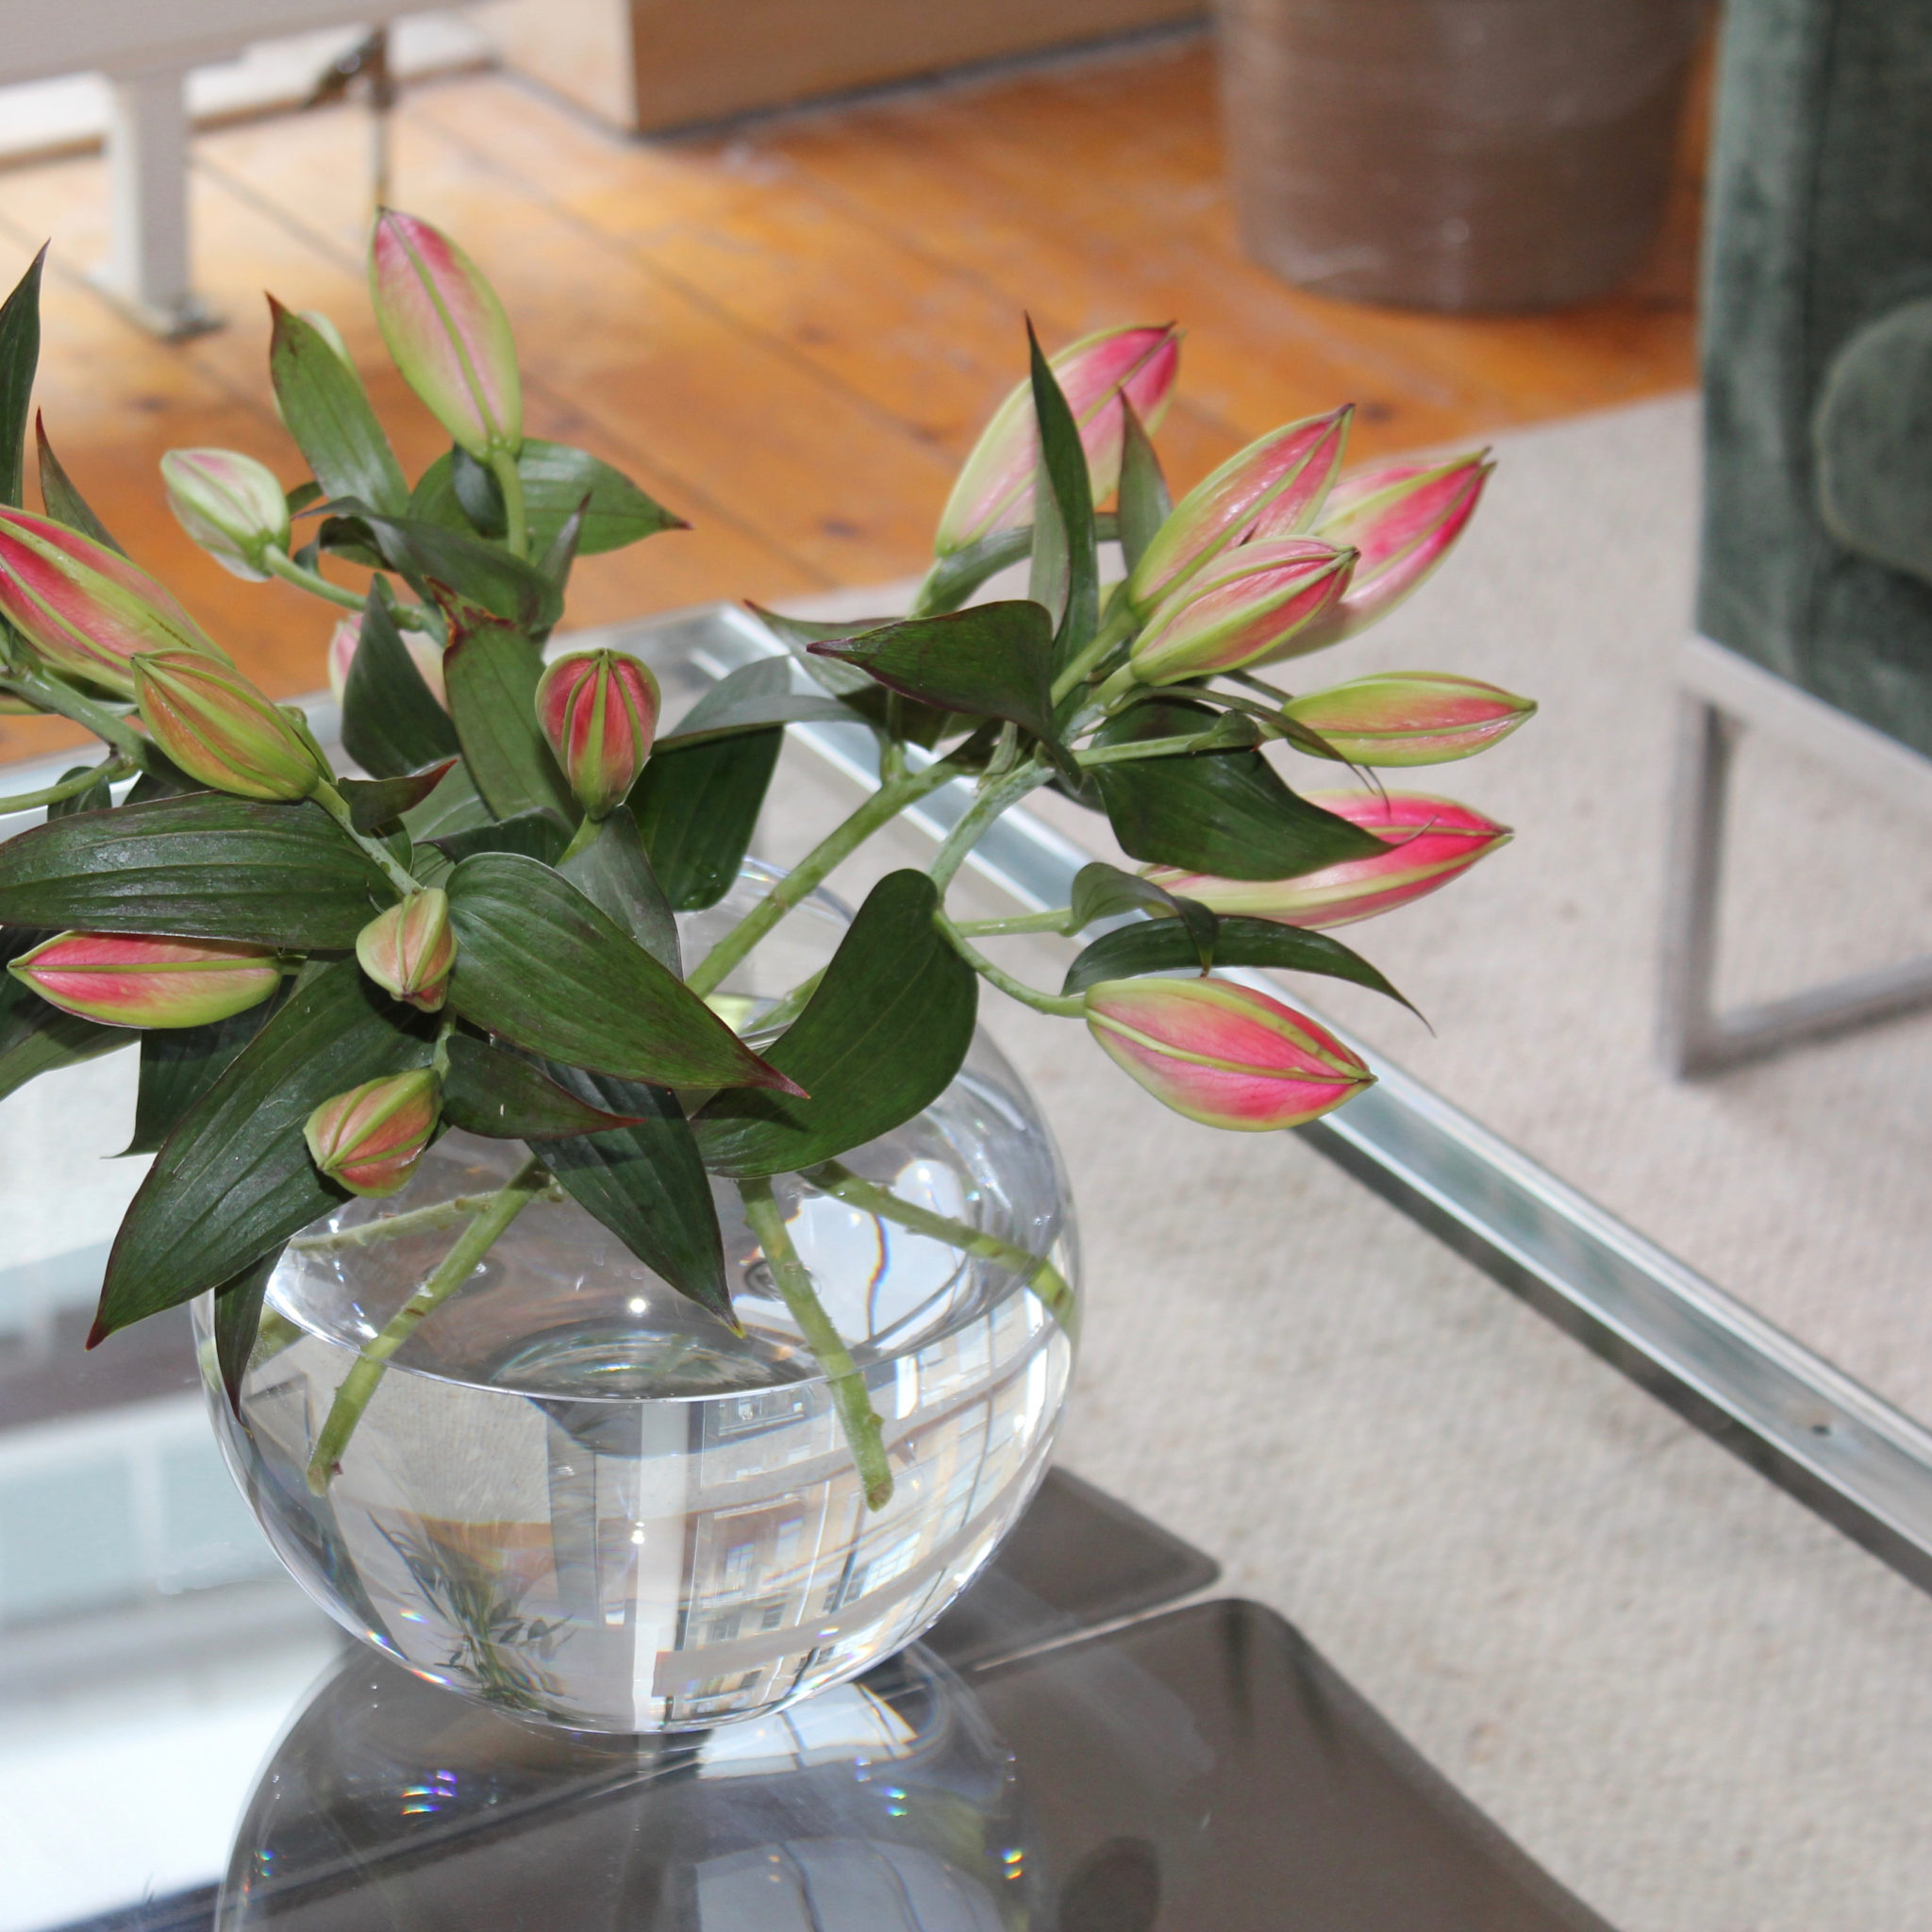 Islington town house flowers in vase